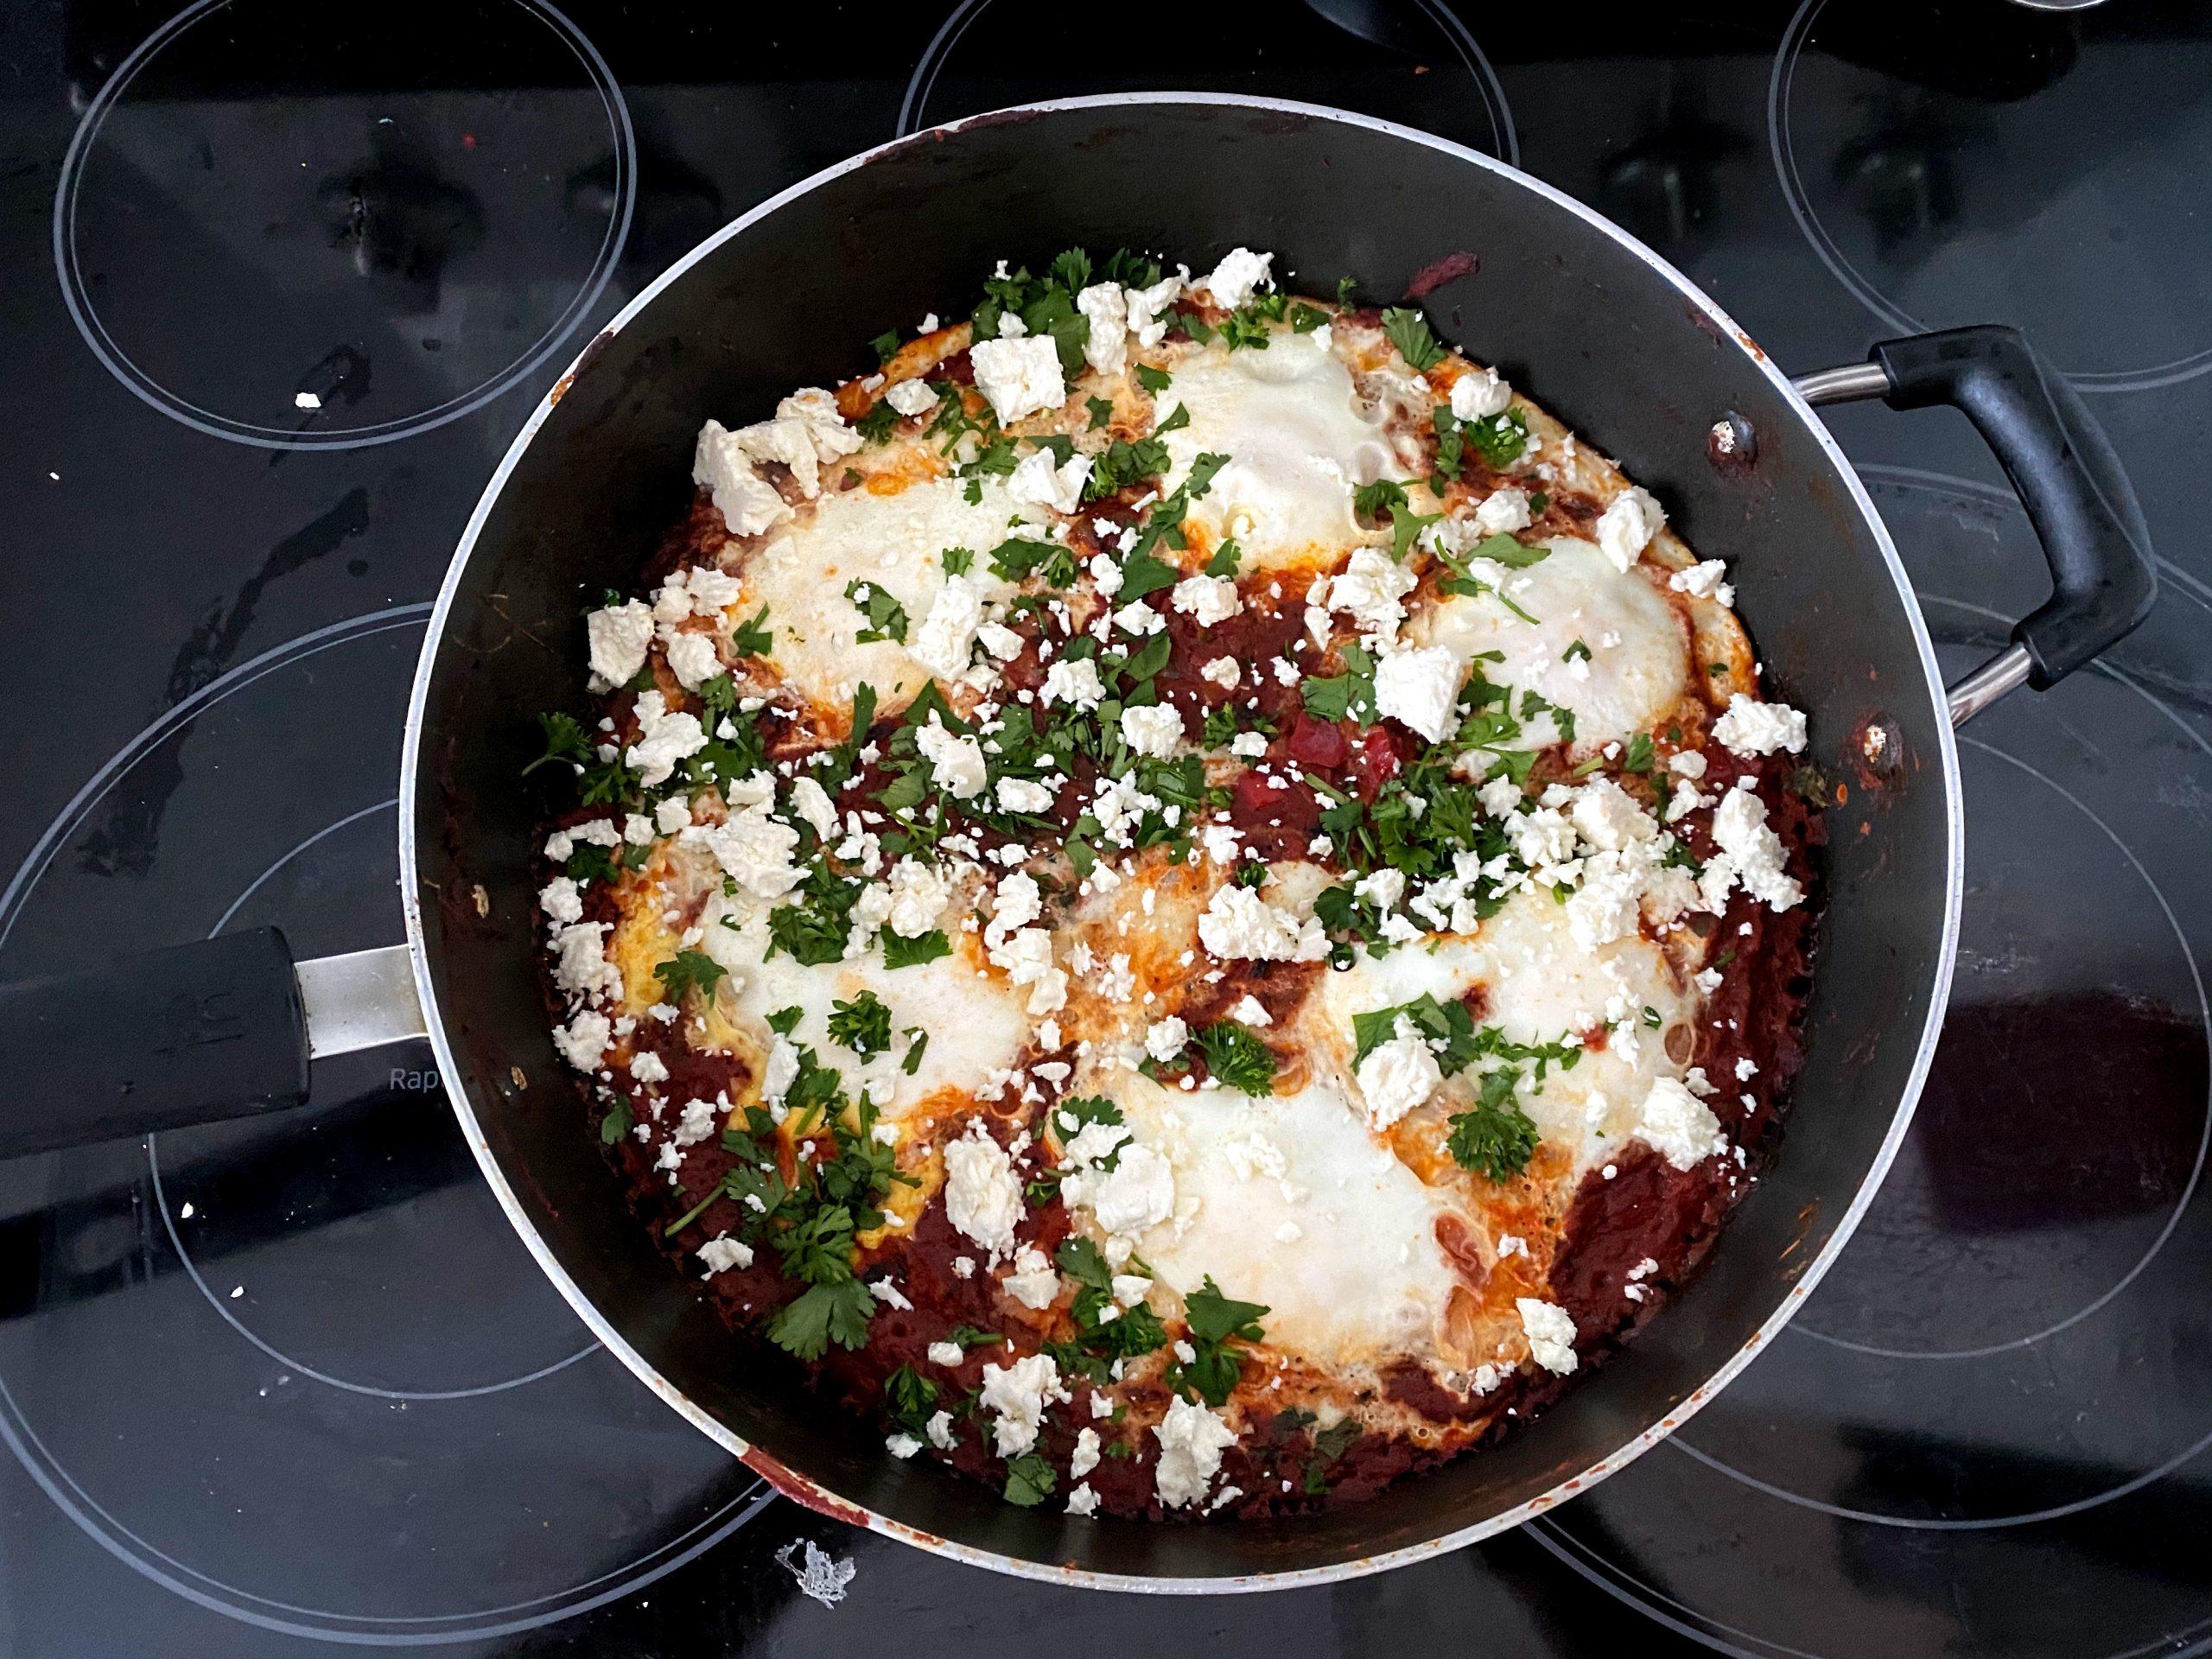 shakshuka edmonton yeg eggs recipes